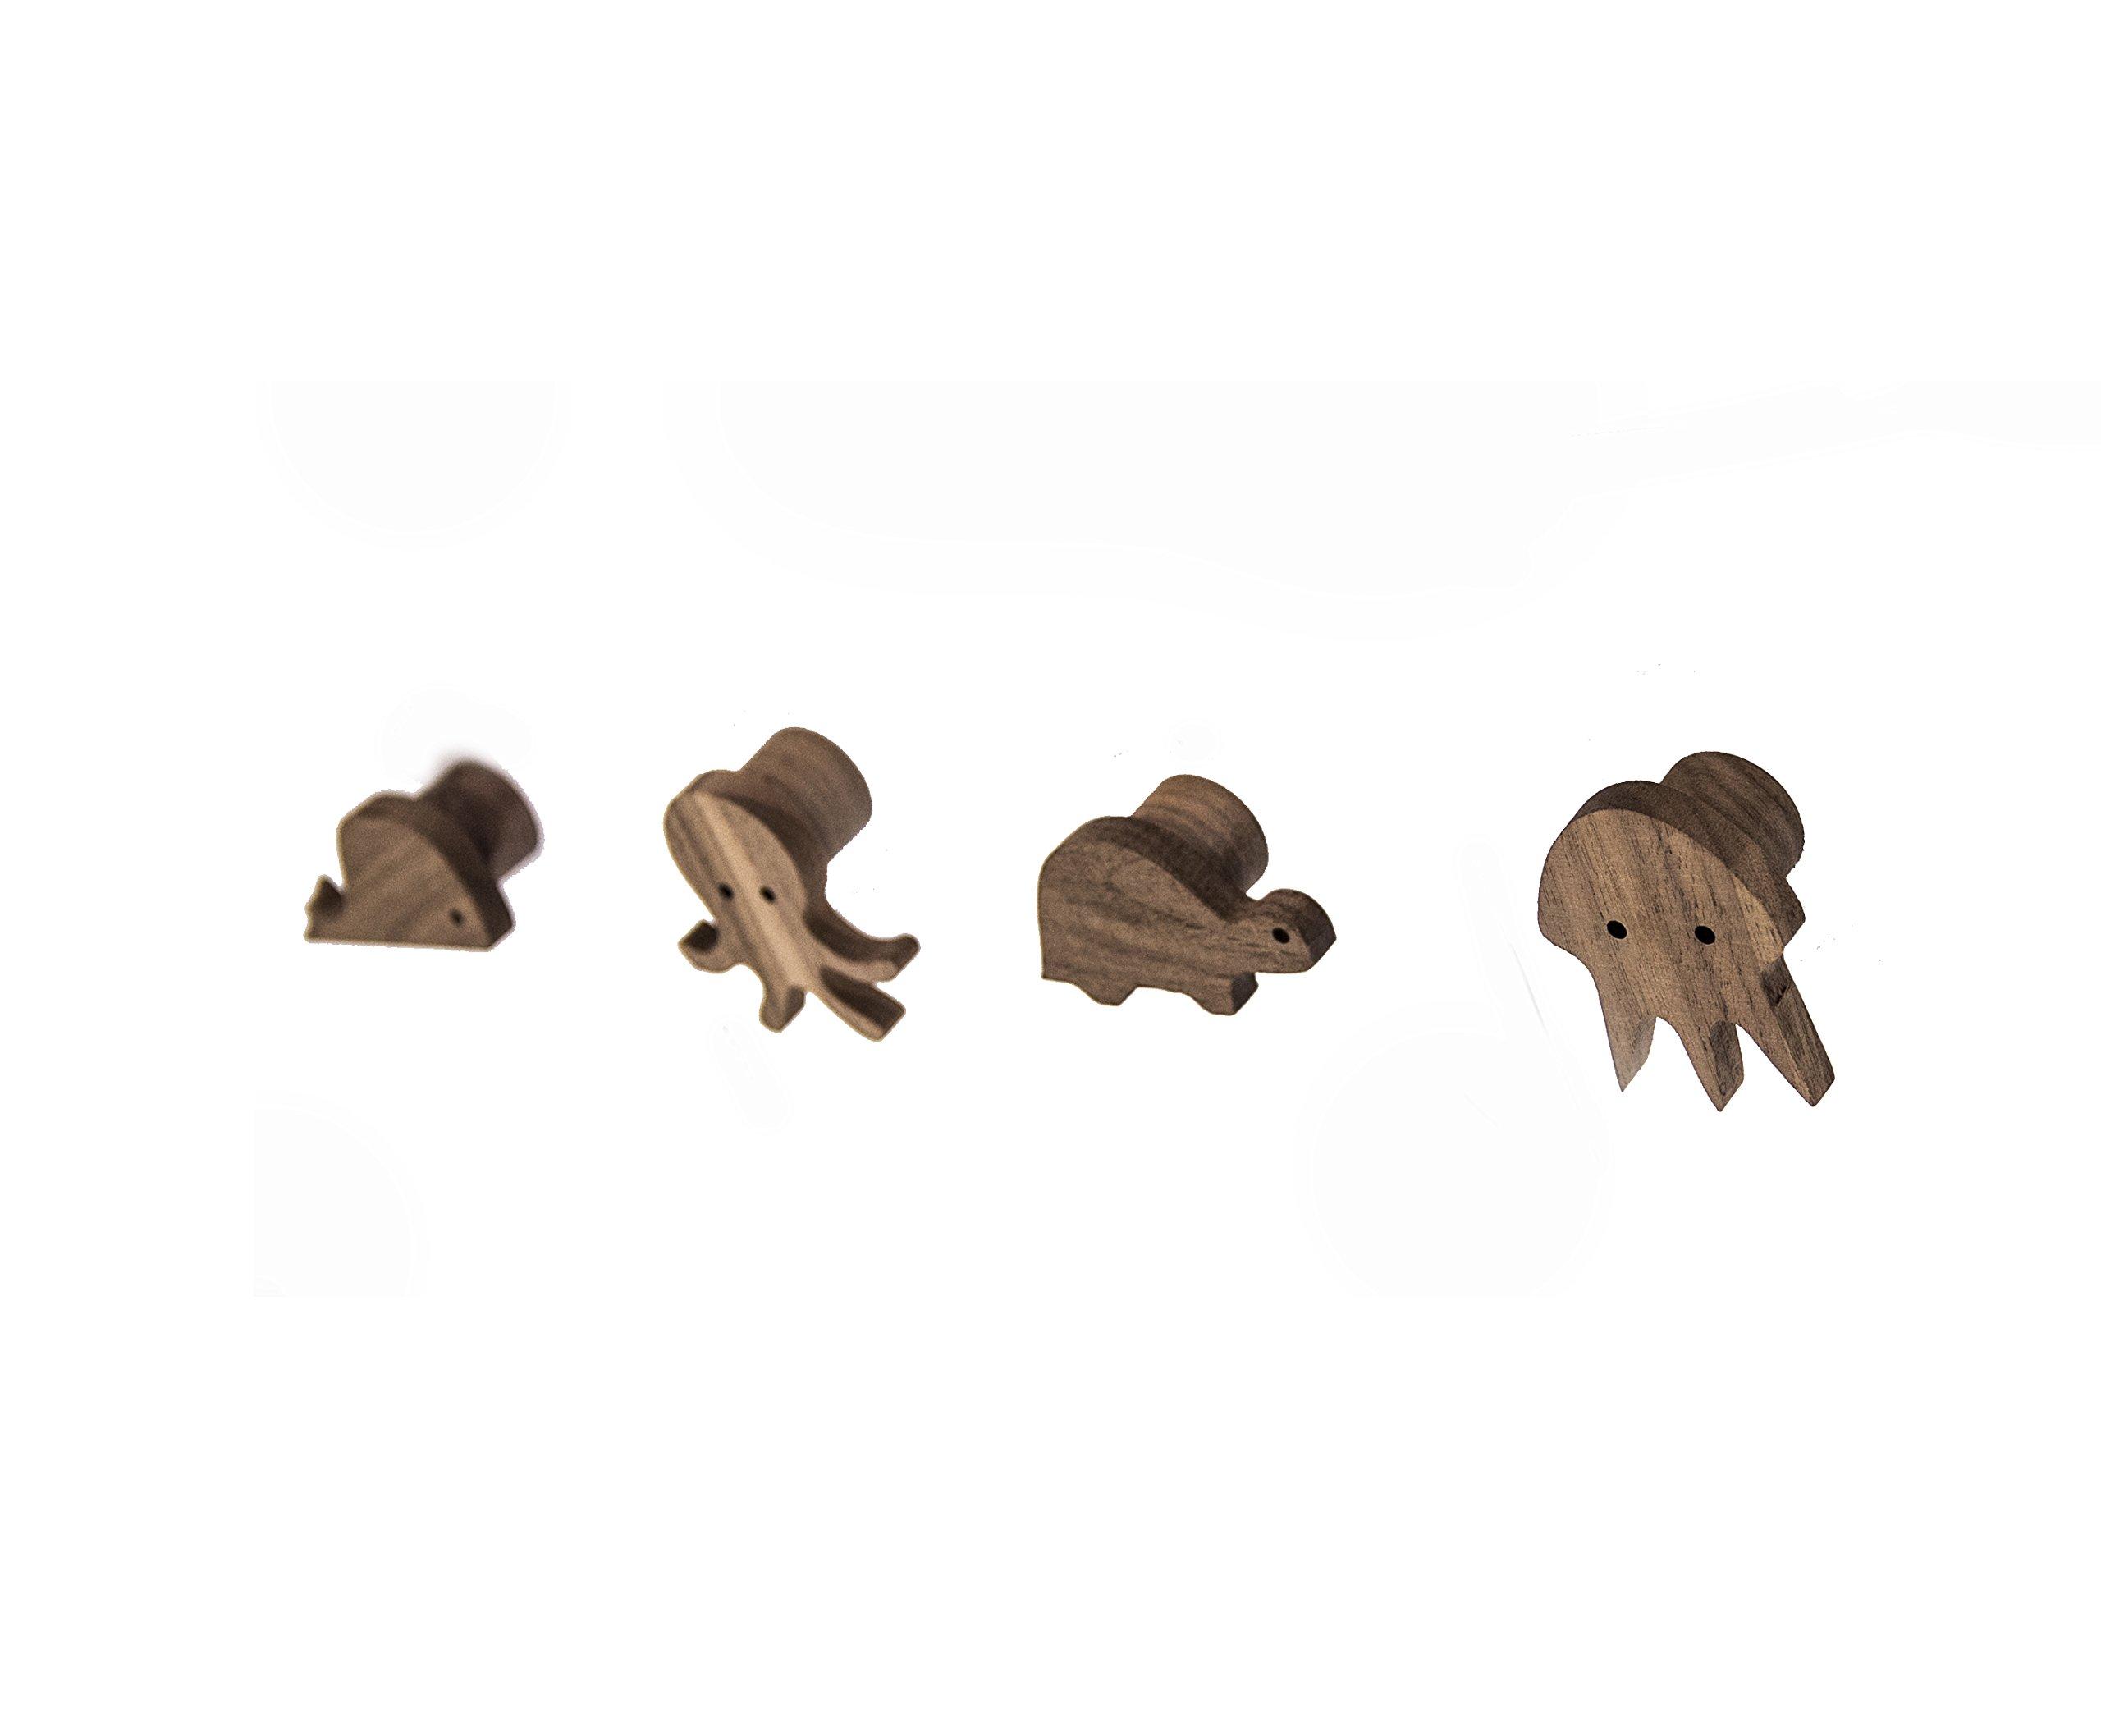 AVIGNON HOME Sea Animals Natural Wooden Coat Hooks Wall Mounted Vintage Single Organizer Hangers, Handmade Craft Hat Rack (Set of 4 Pieces)